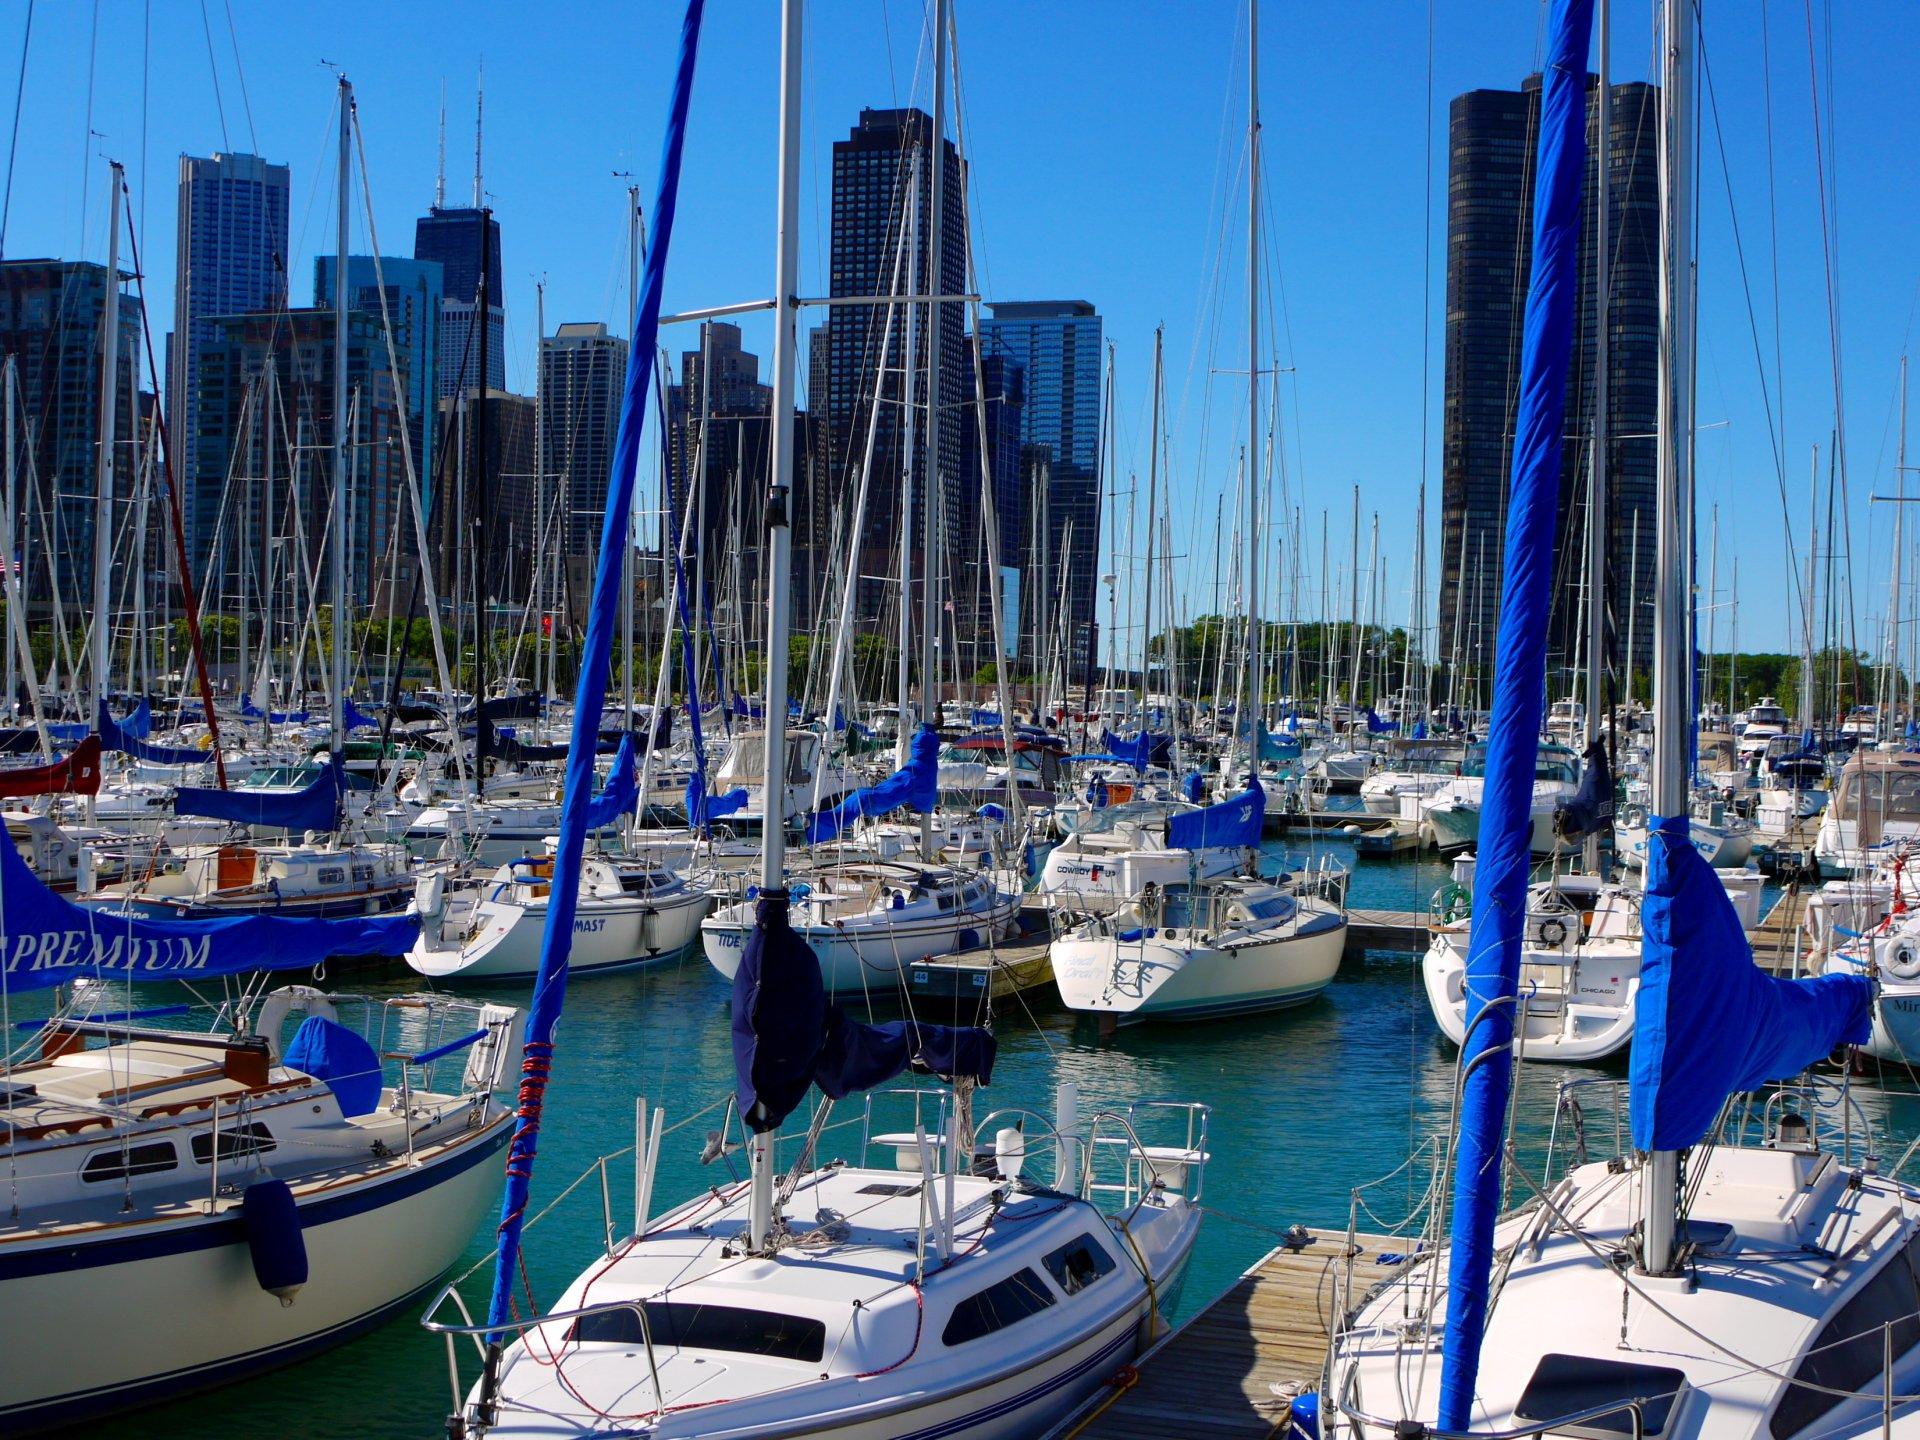 navy pier chicago wallpaper - photo #4